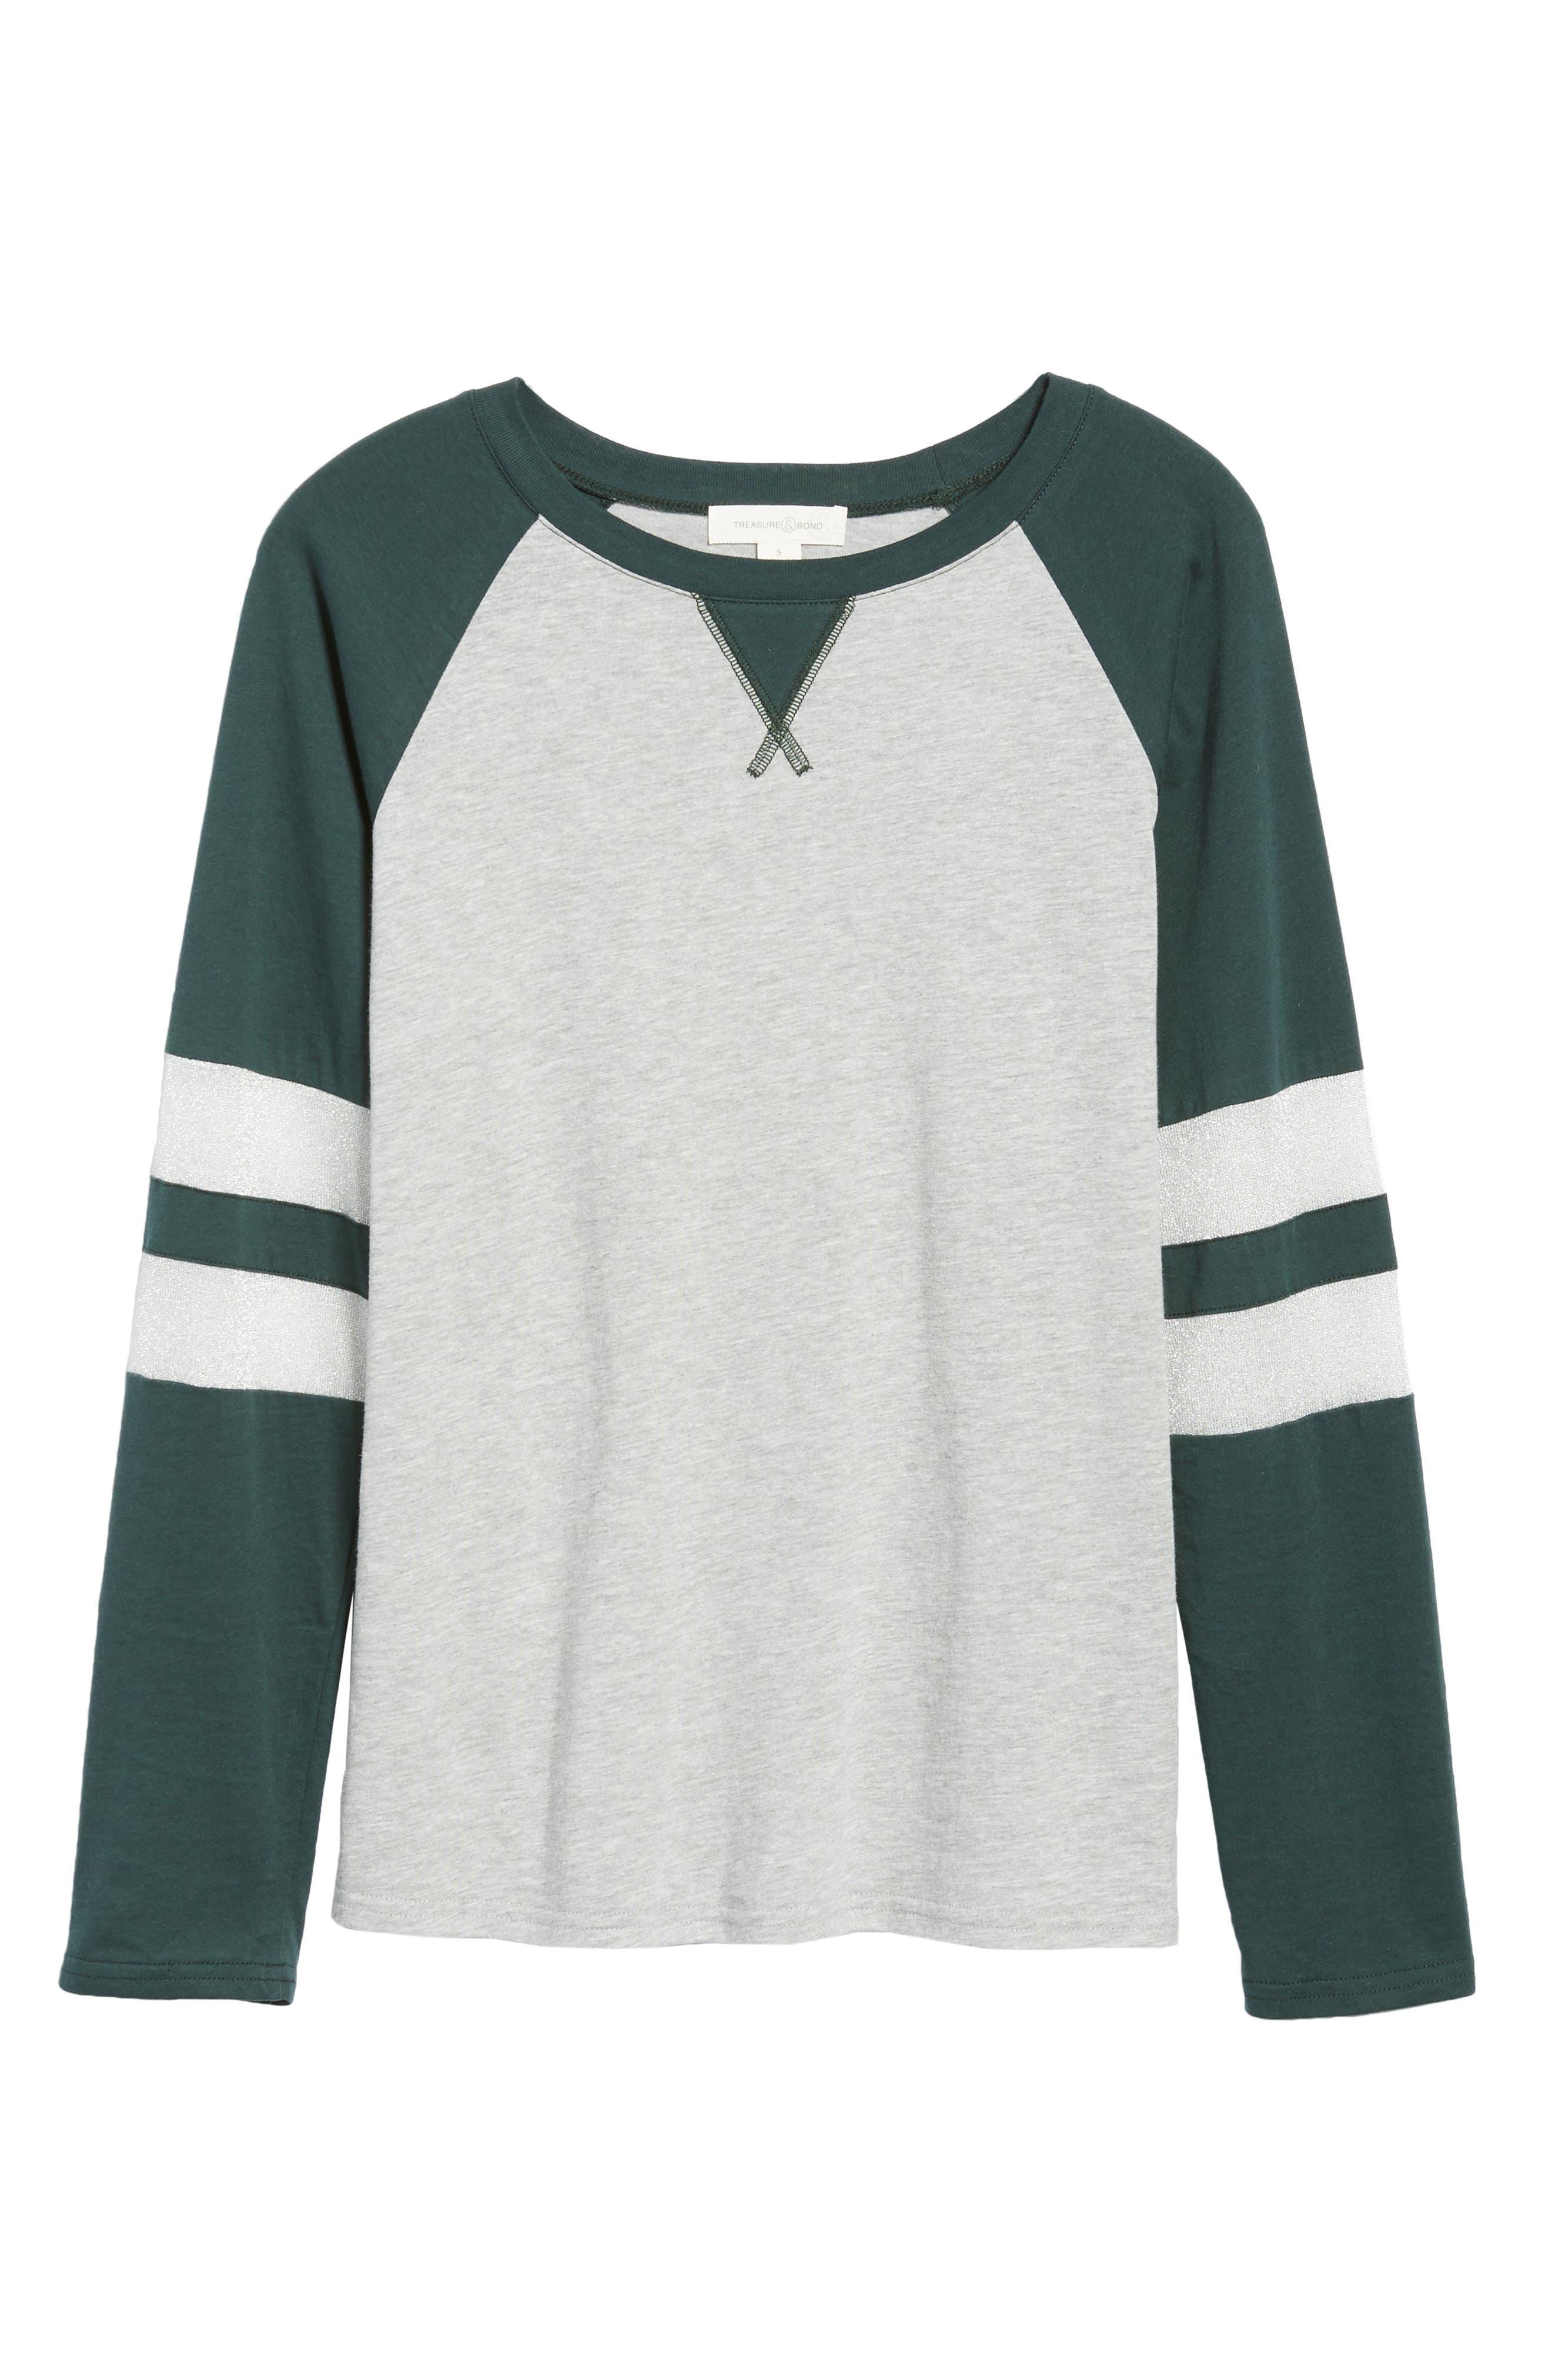 Colorblock Cotton Blend Raglan Top,                             Alternate thumbnail 6, color,                             GREY- GREEN GABLES COMBO